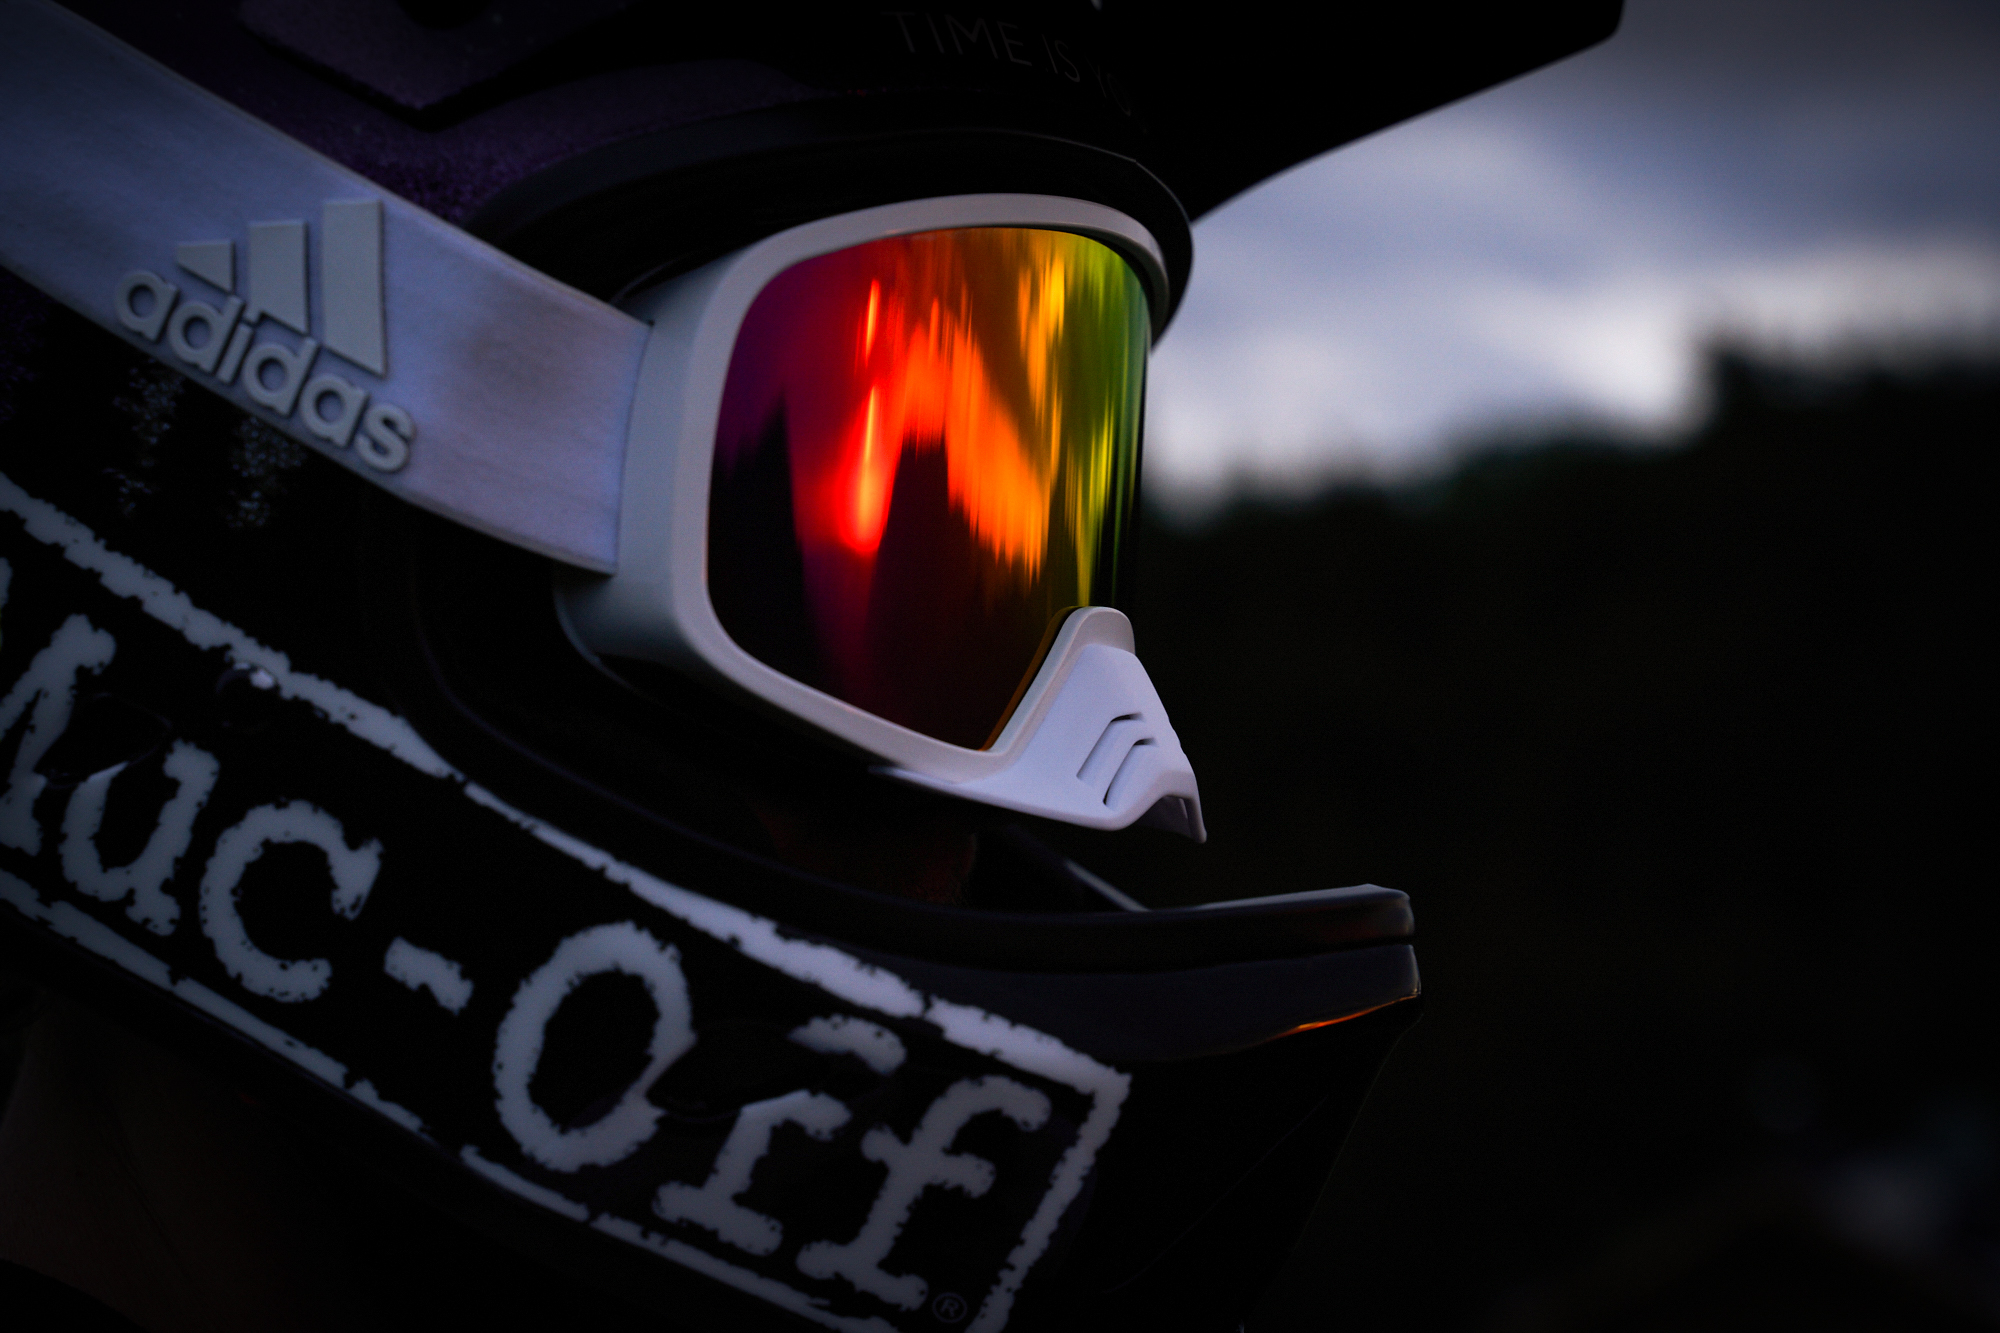 Hannes Klausner - Custom Helmet Image 2